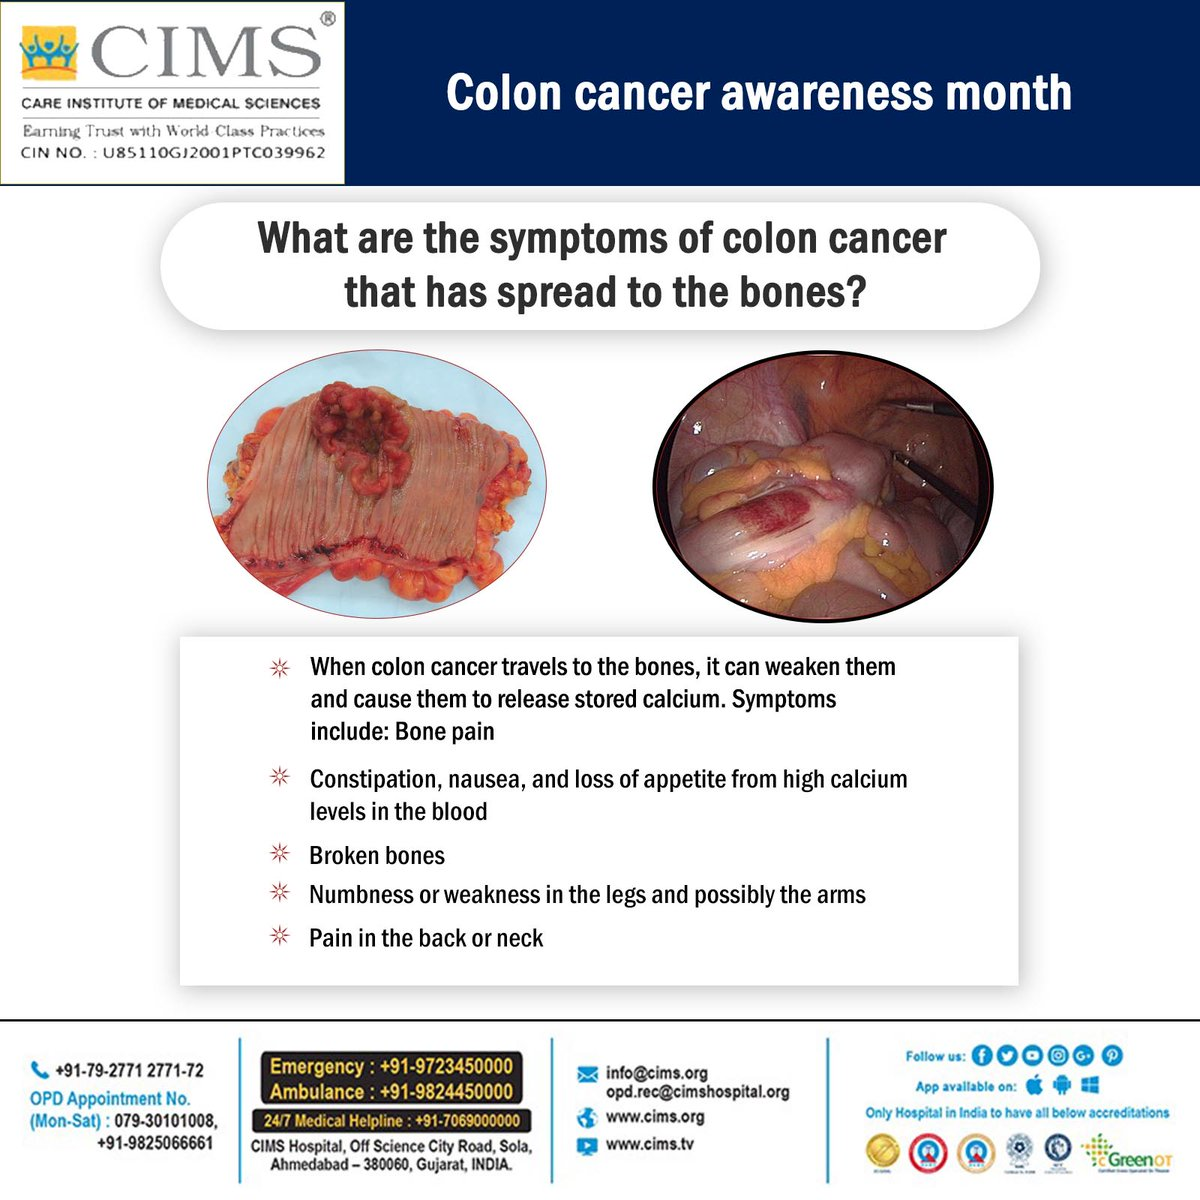 Cims Cancer Center On Twitter Colon Cancer Awareness Month Awareness Cancer Symptoms Colon Cancer Bone Pain Constipation Calcium Numbness Cimscancer Cims Cimshospital Https T Co Mclvjscrwn